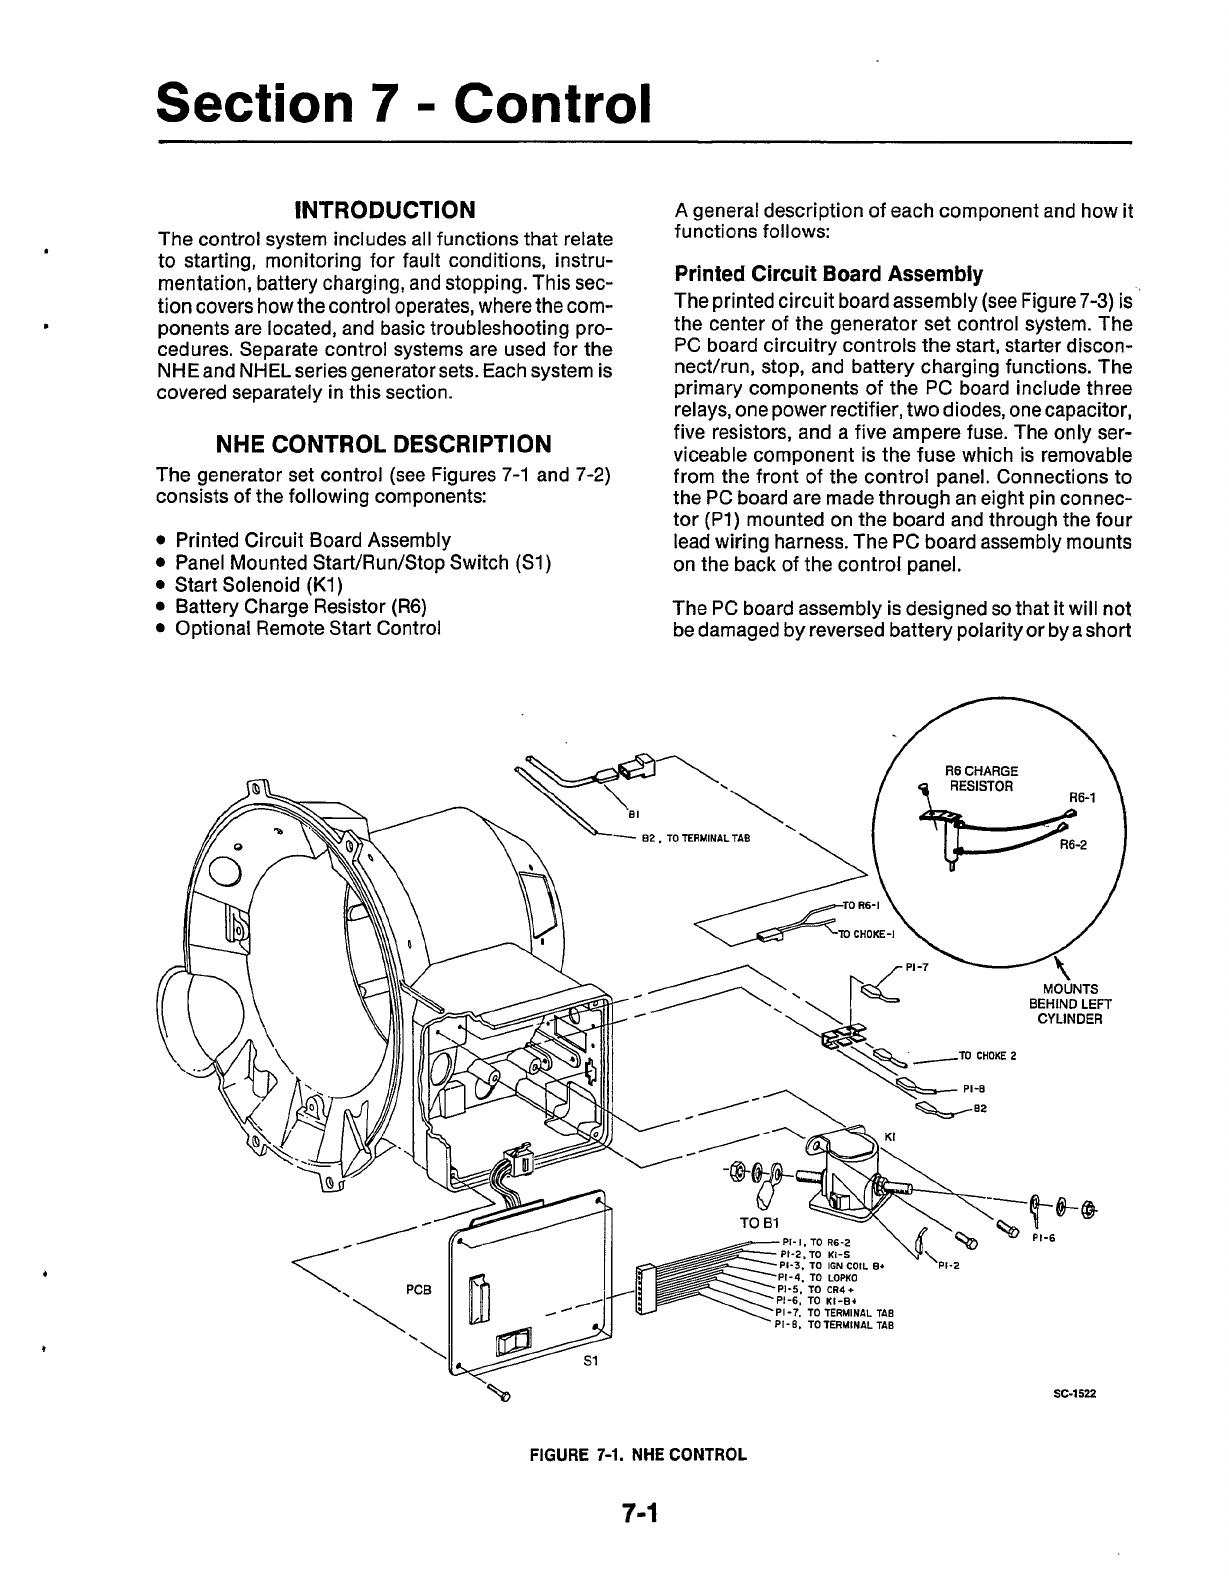 940 0502 Onan Nhe Nhel Spec A C Rv Genset Service Manual 07 1987 Skun Pcb Set 7500 5